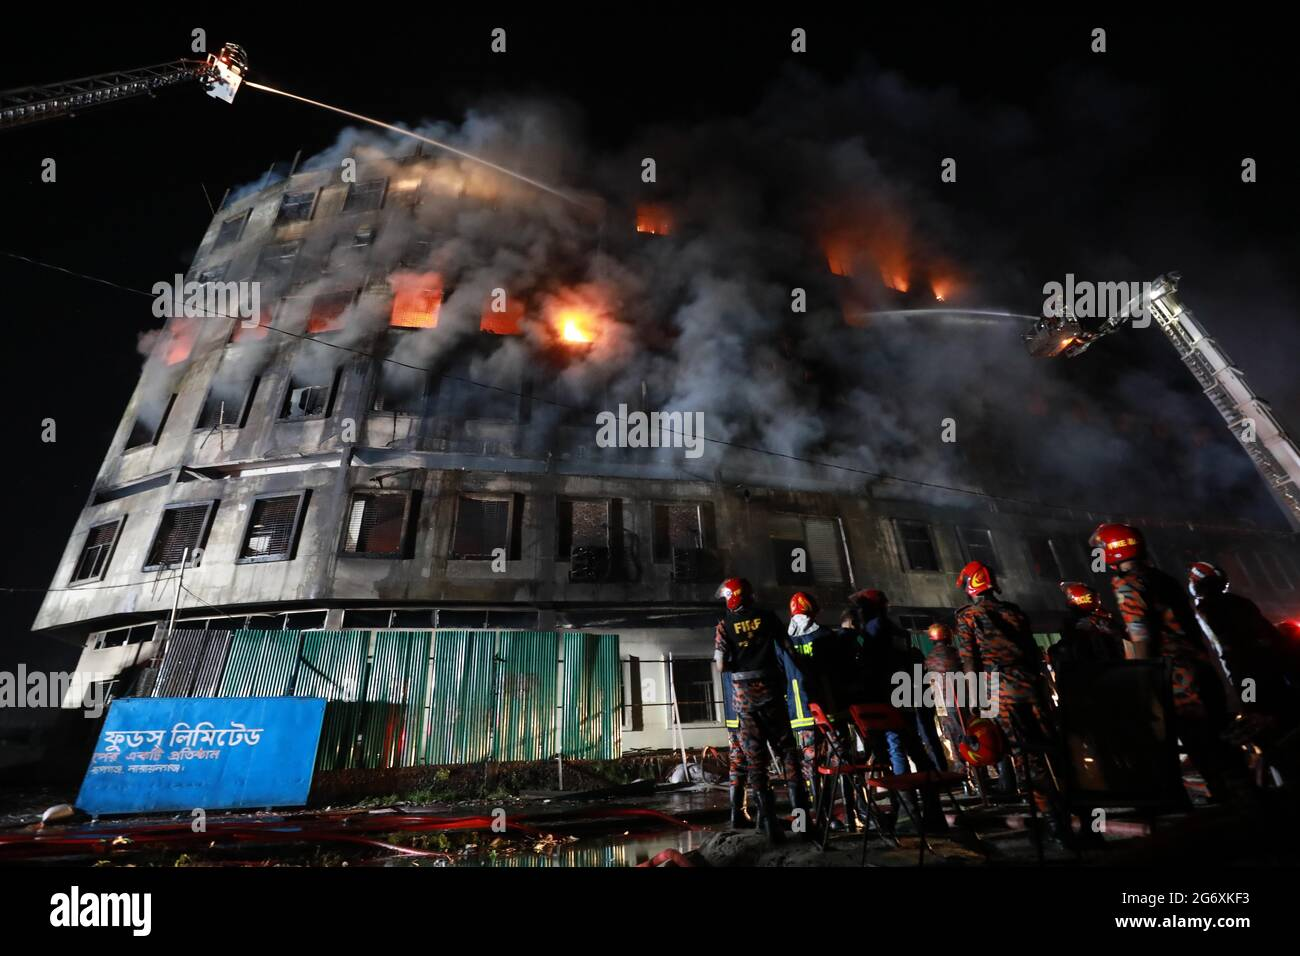 Dhaka, Dhaka, Bangladesch. Juli 2021. 09, Juli 2021 Feuer brach in der Fabrik von Hashem Foods Ltd in Narayanganj's Rupganj in Bangladesch aus.Quelle: Harun-or-Rashid/ZUMA Wire/Alamy Live News Stockfoto